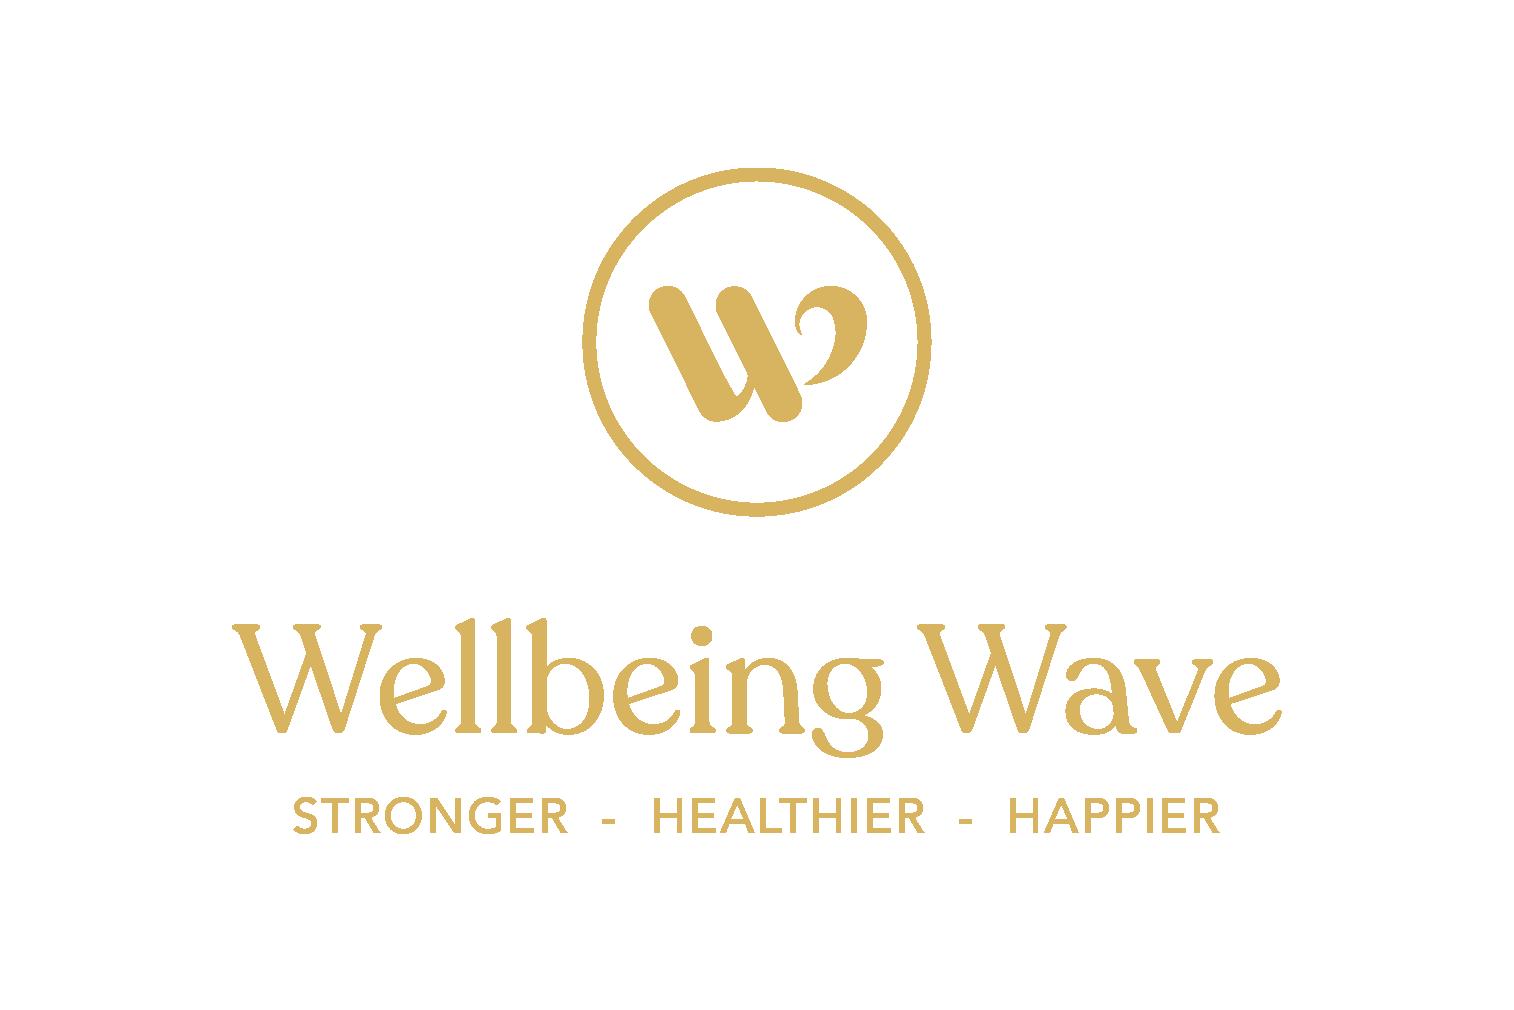 Wellbeing wave logo